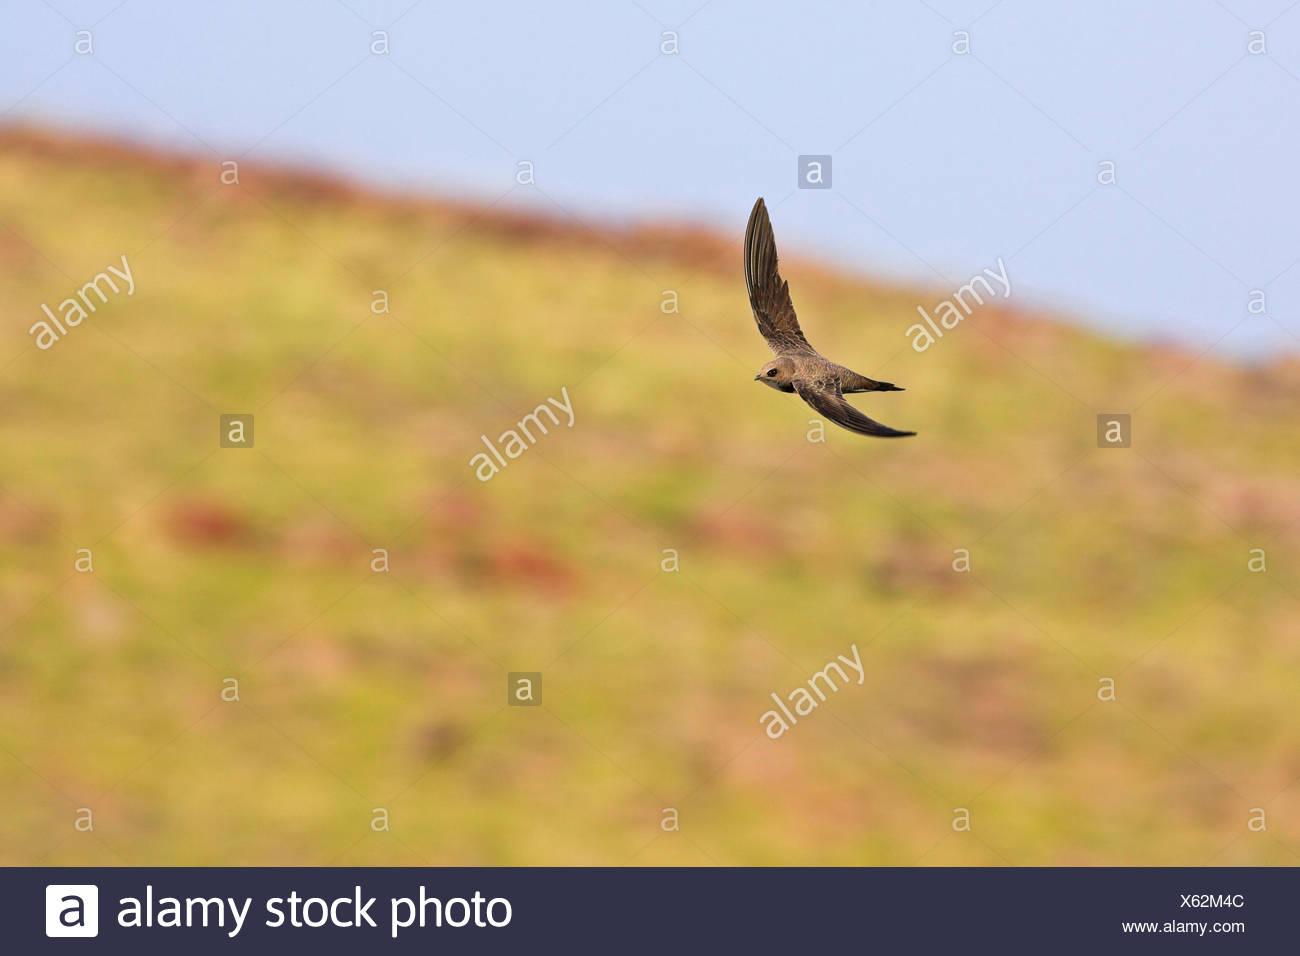 alpine swift (Apus melba, Tachymarptis melba), flying, Austria Stock Photo